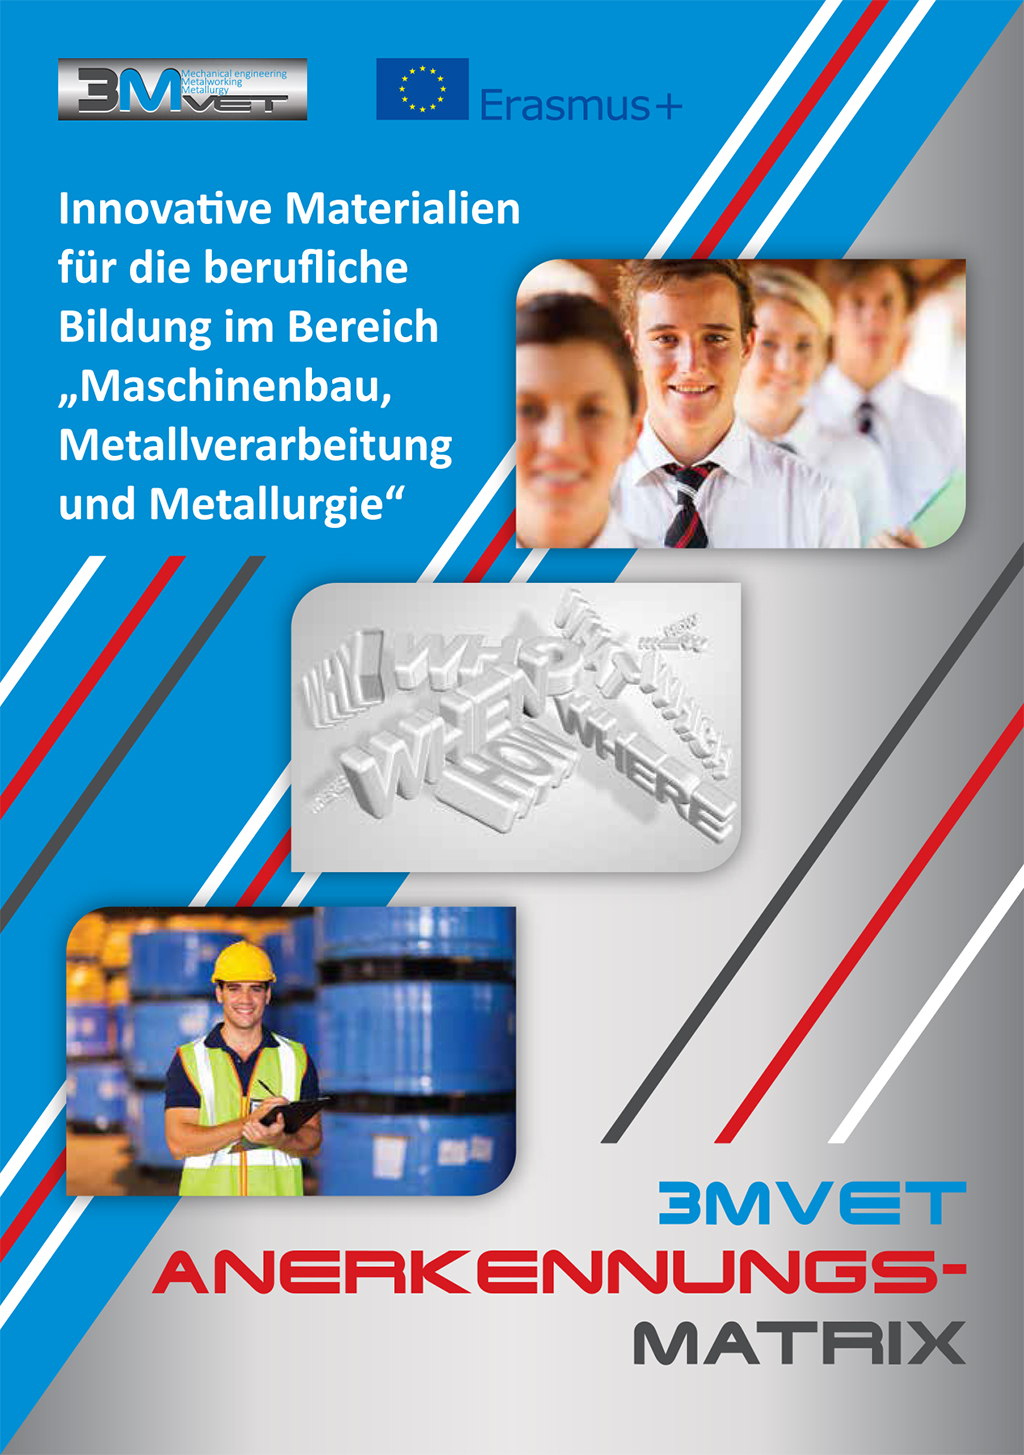 3MVET-Anerkennungsmatrix